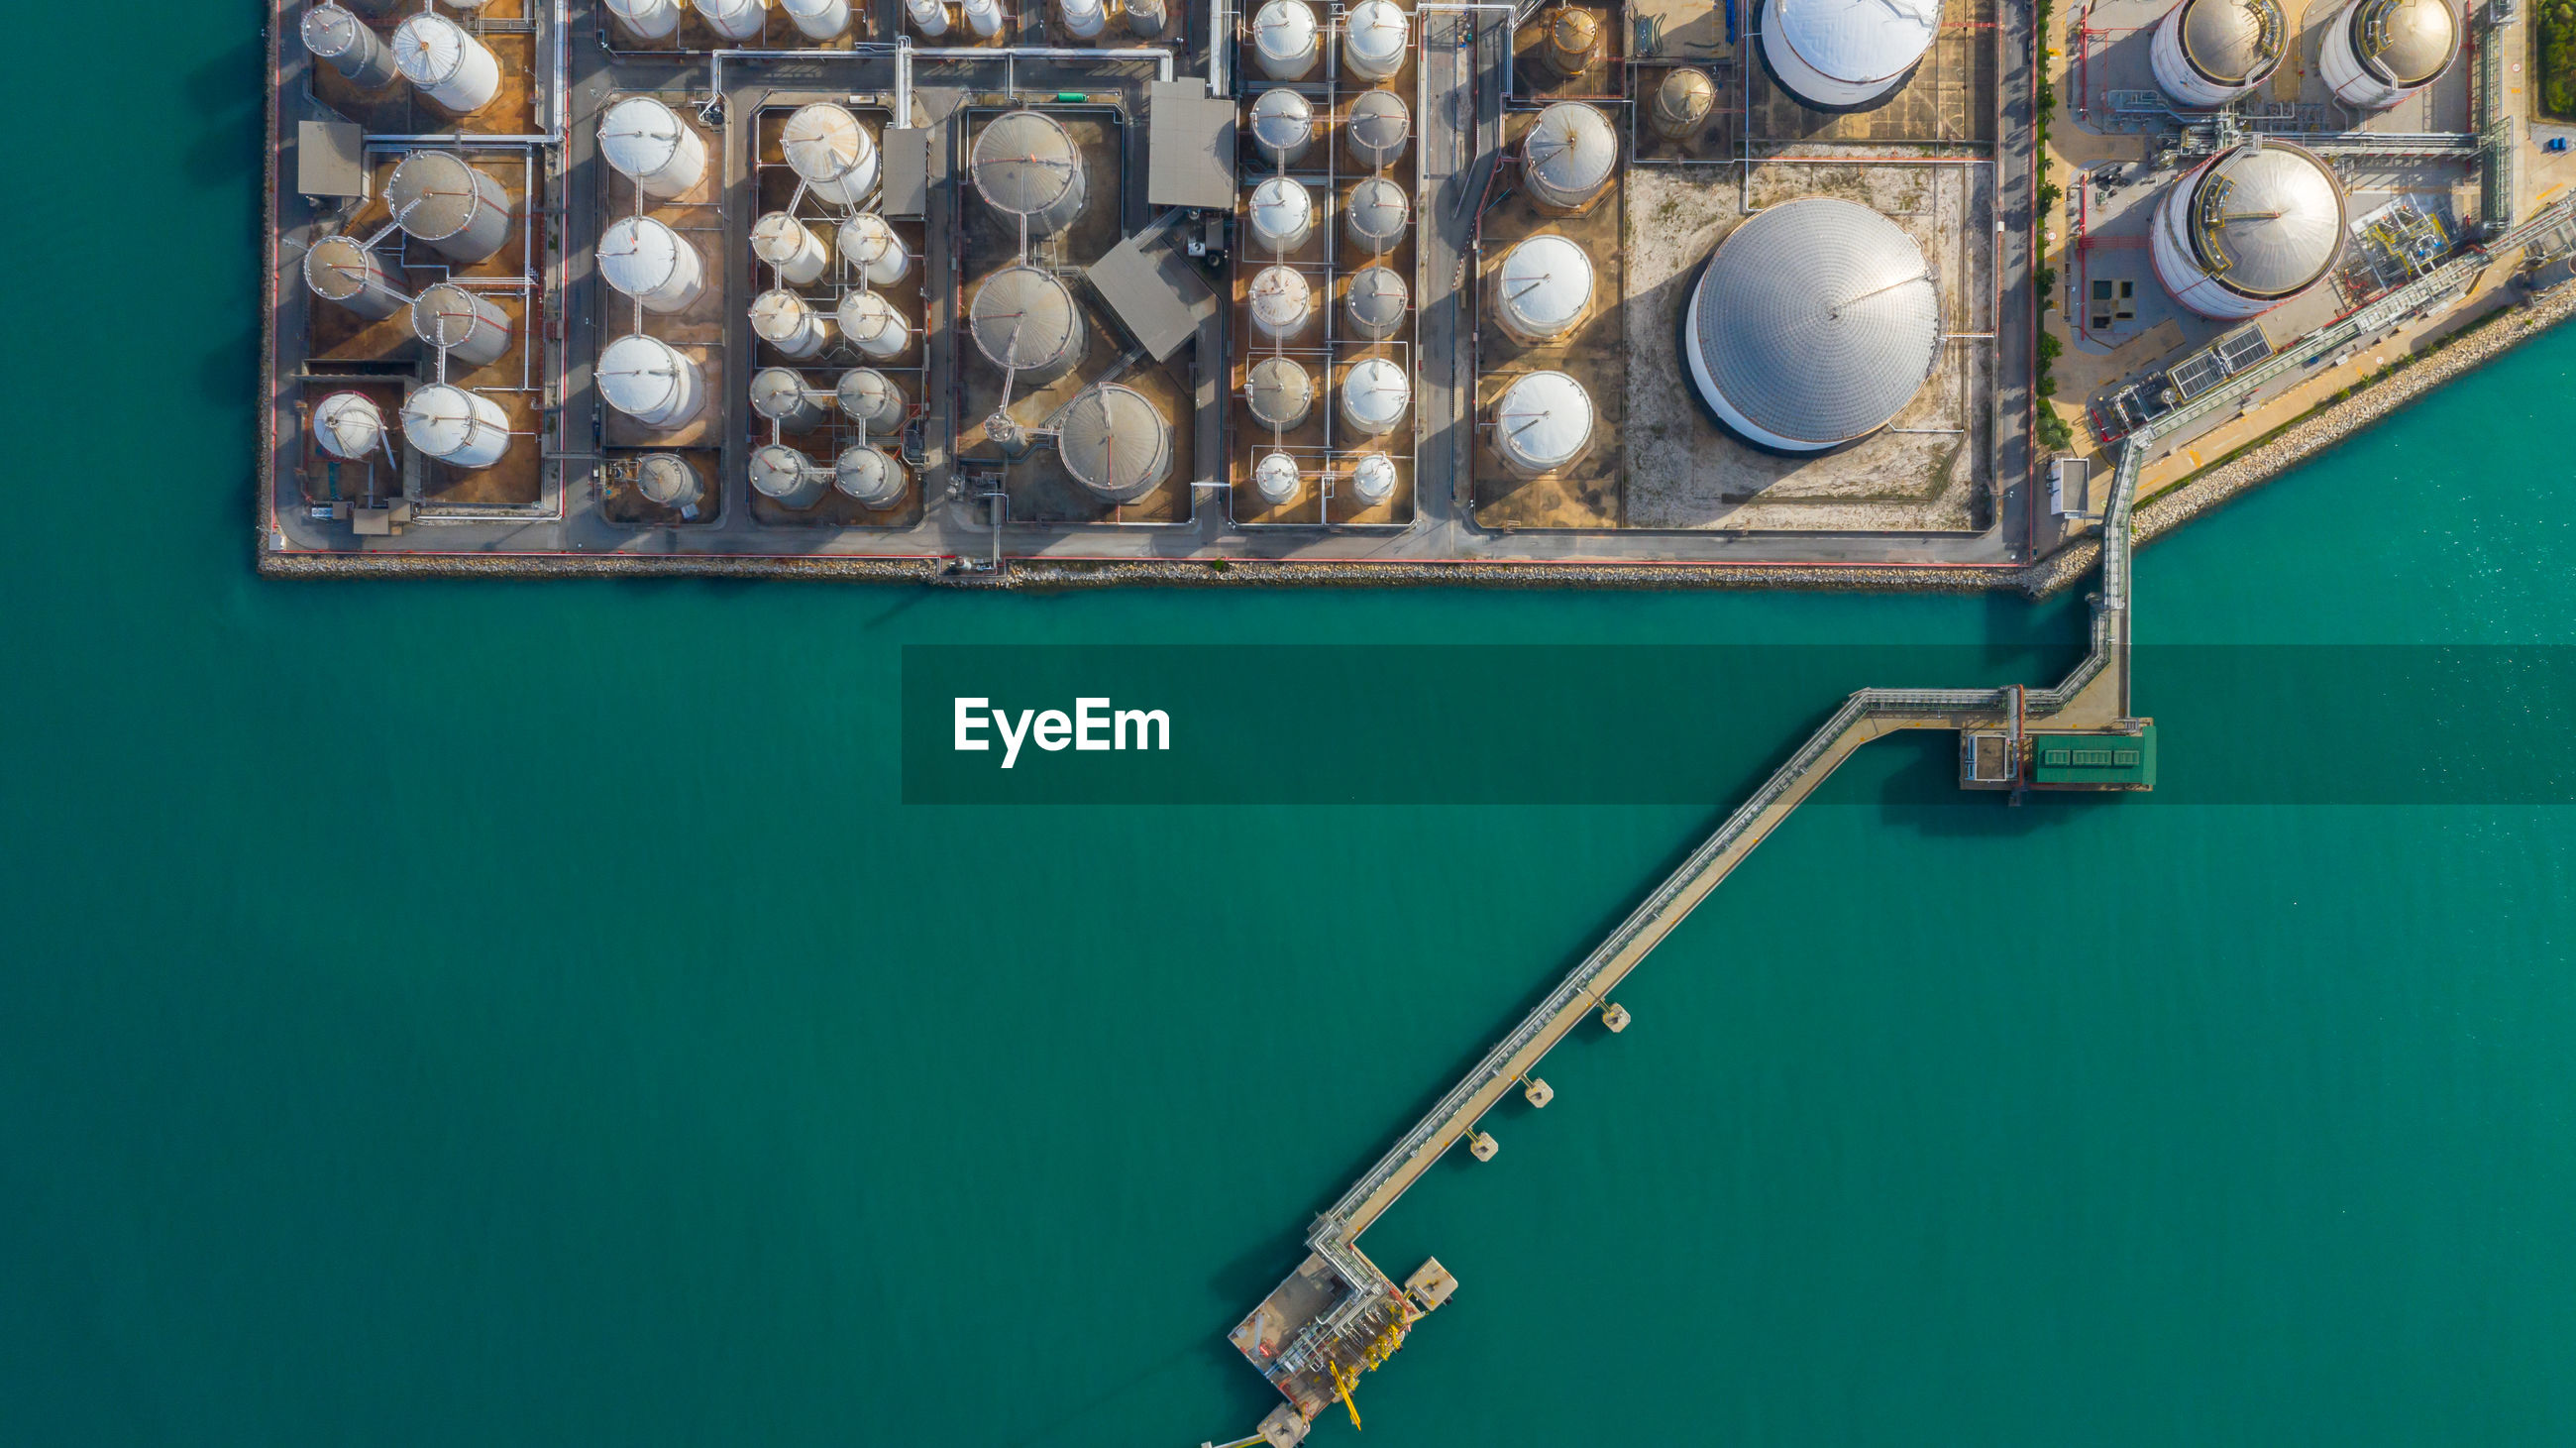 Aerial view of storage tanks